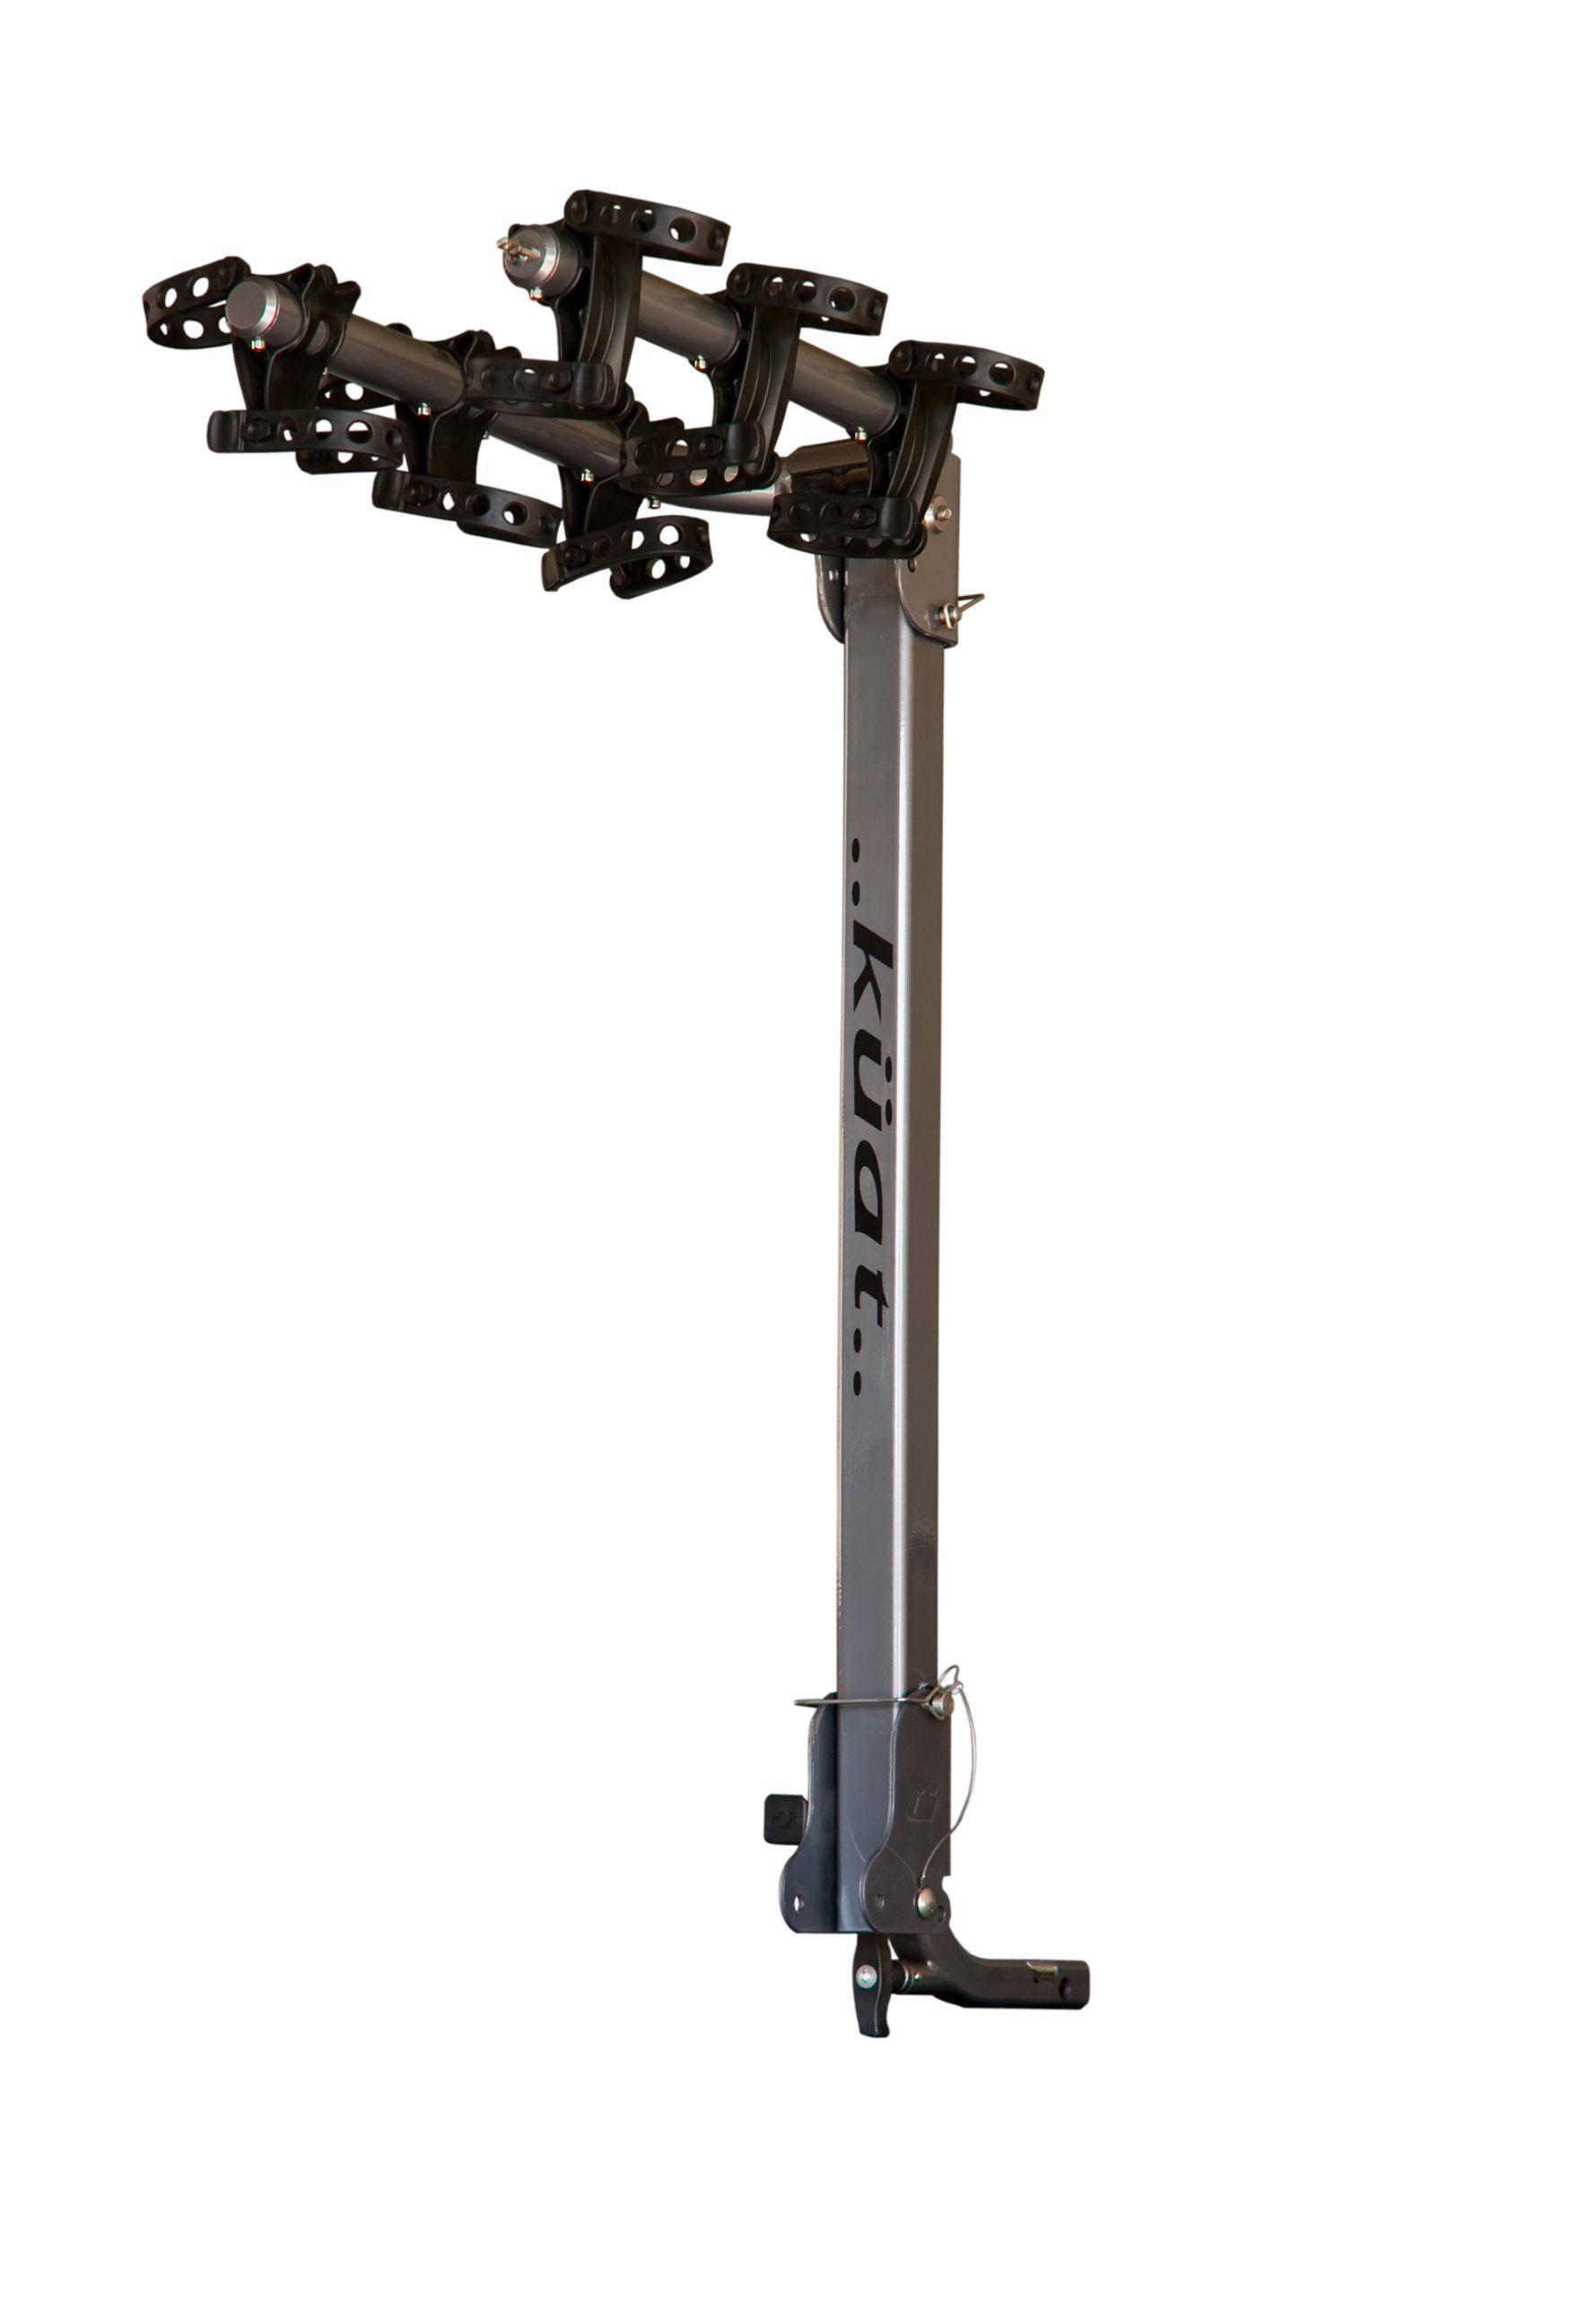 nv kuat gunmetal bike sherpa beta racks rack hitch australia grey inch